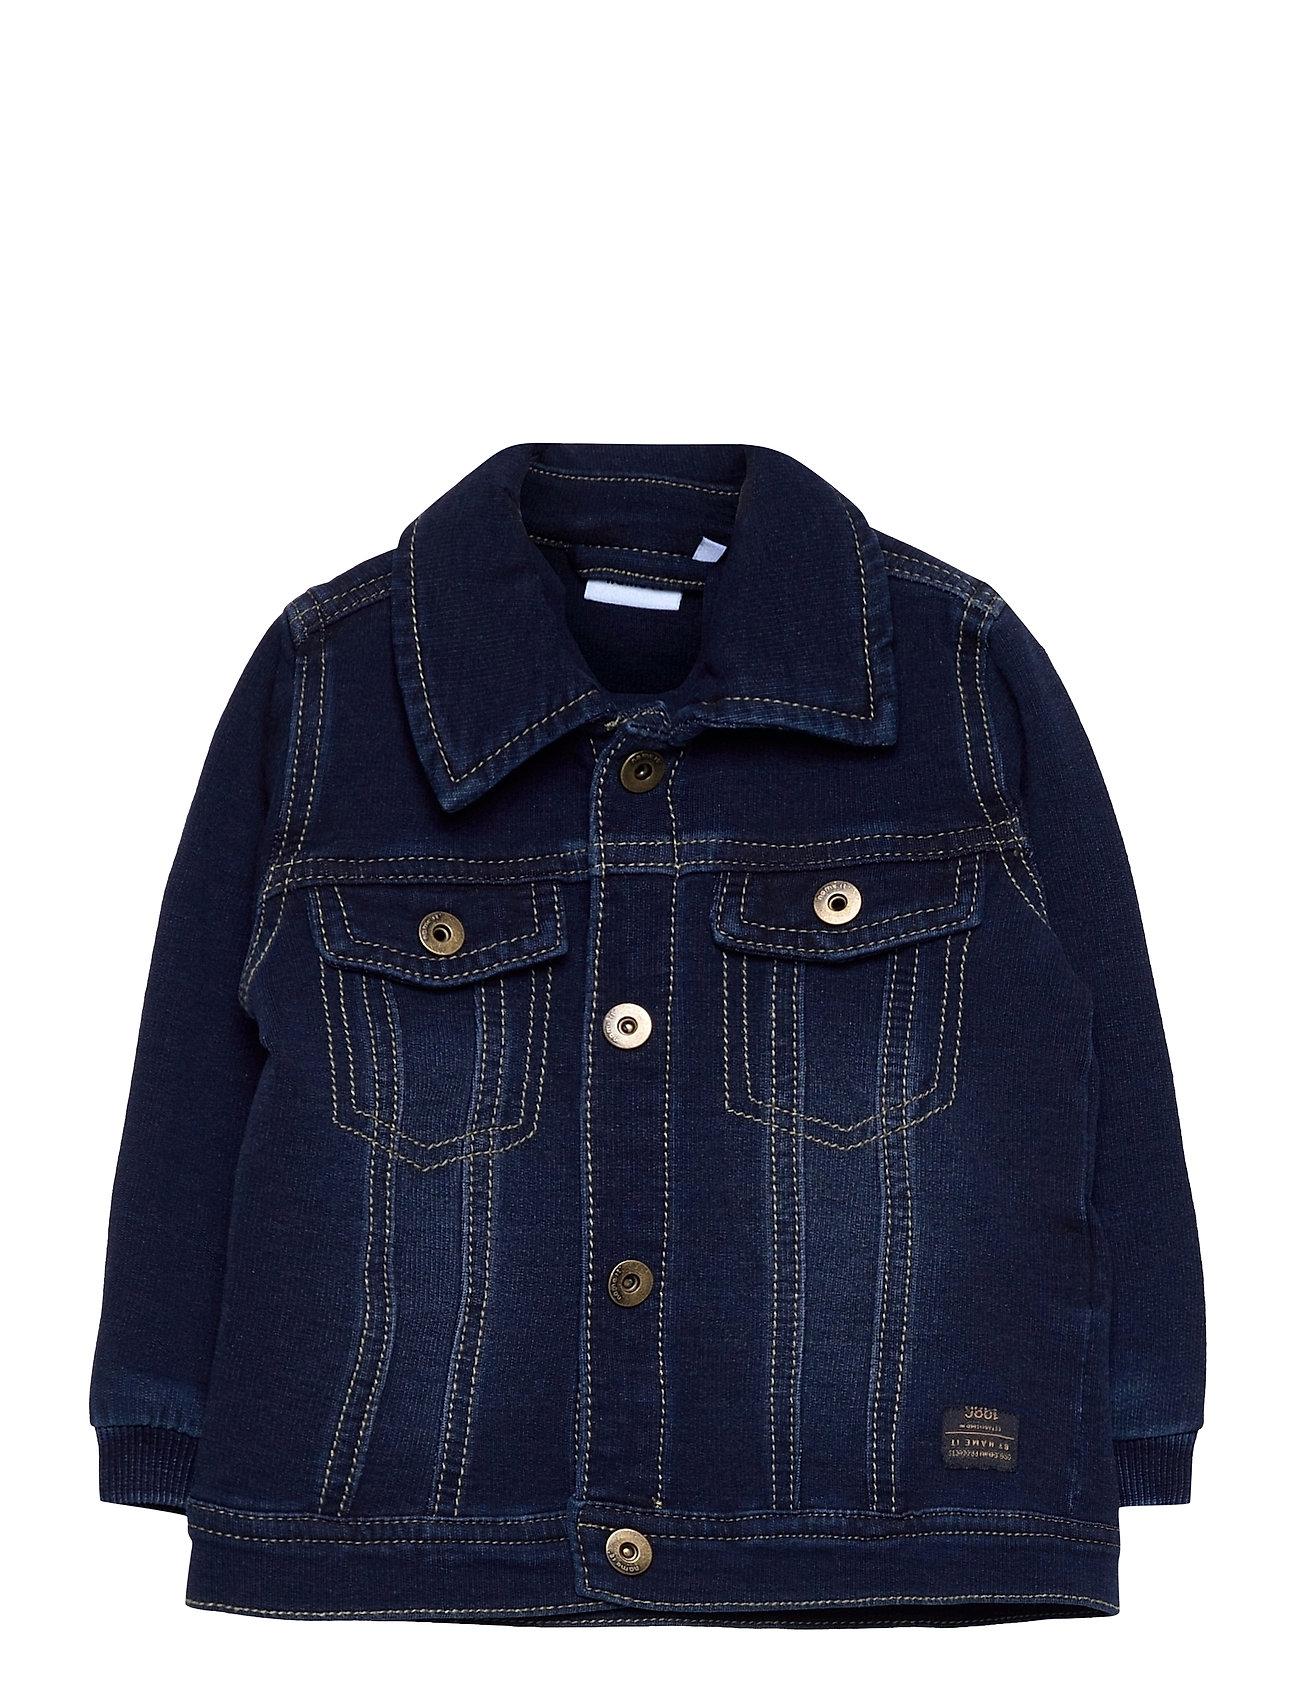 Nbmbtruebos 3526 Swe Dnm Cardigan Outerwear Jackets & Coats Denim & Corduroy Blå Name It